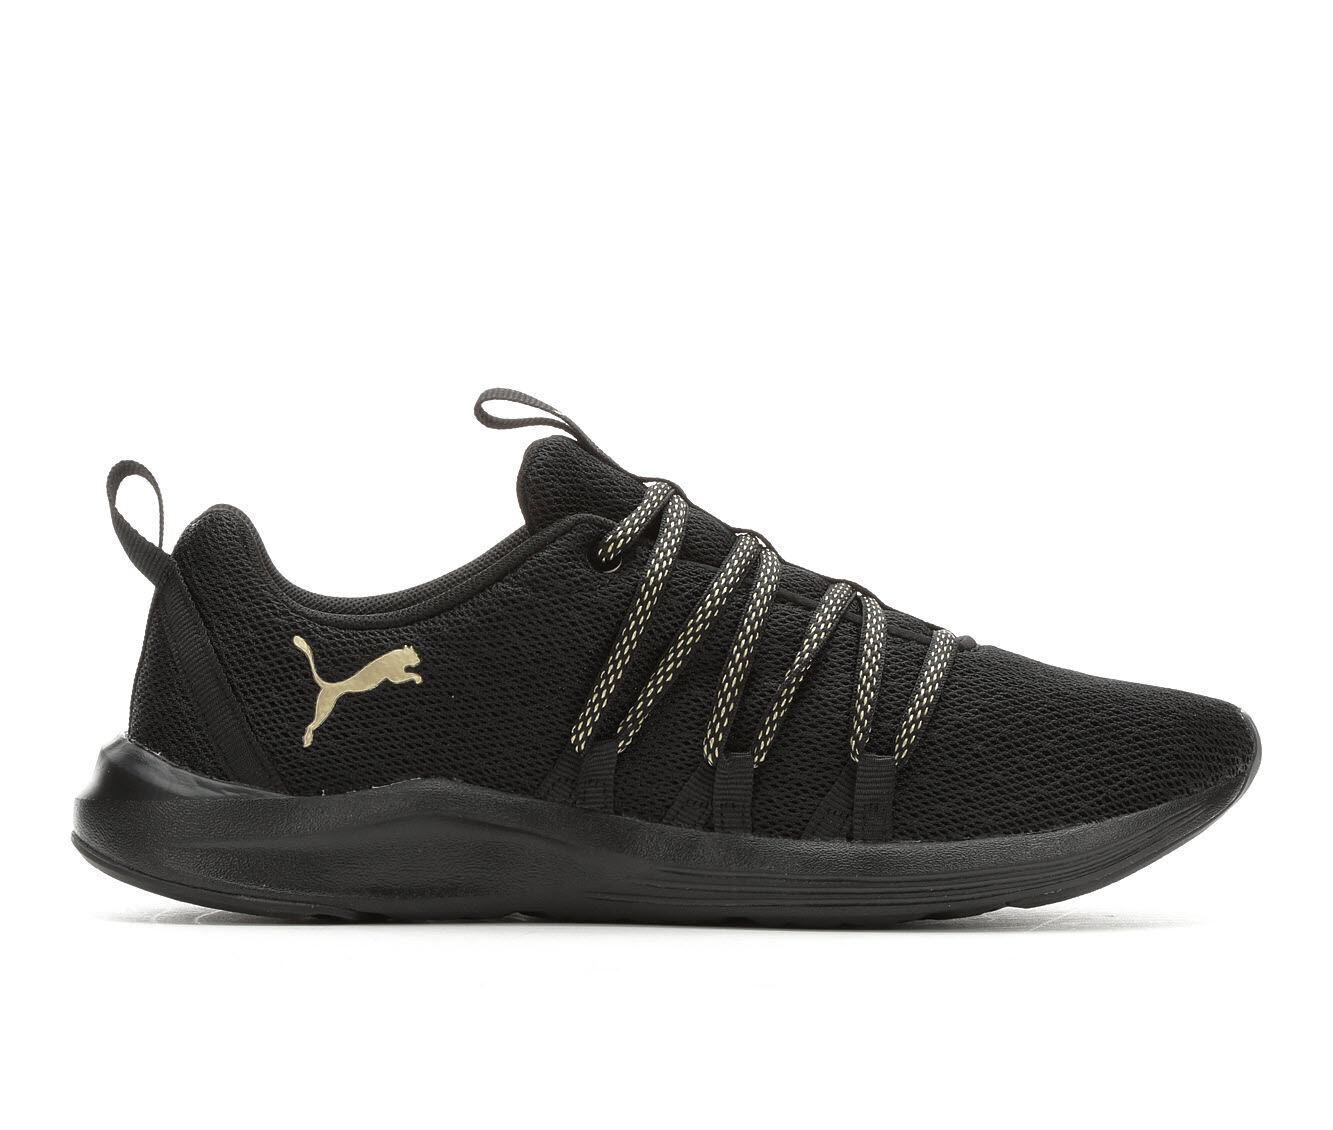 Women's Puma Prowl Sneakers Black/Gold